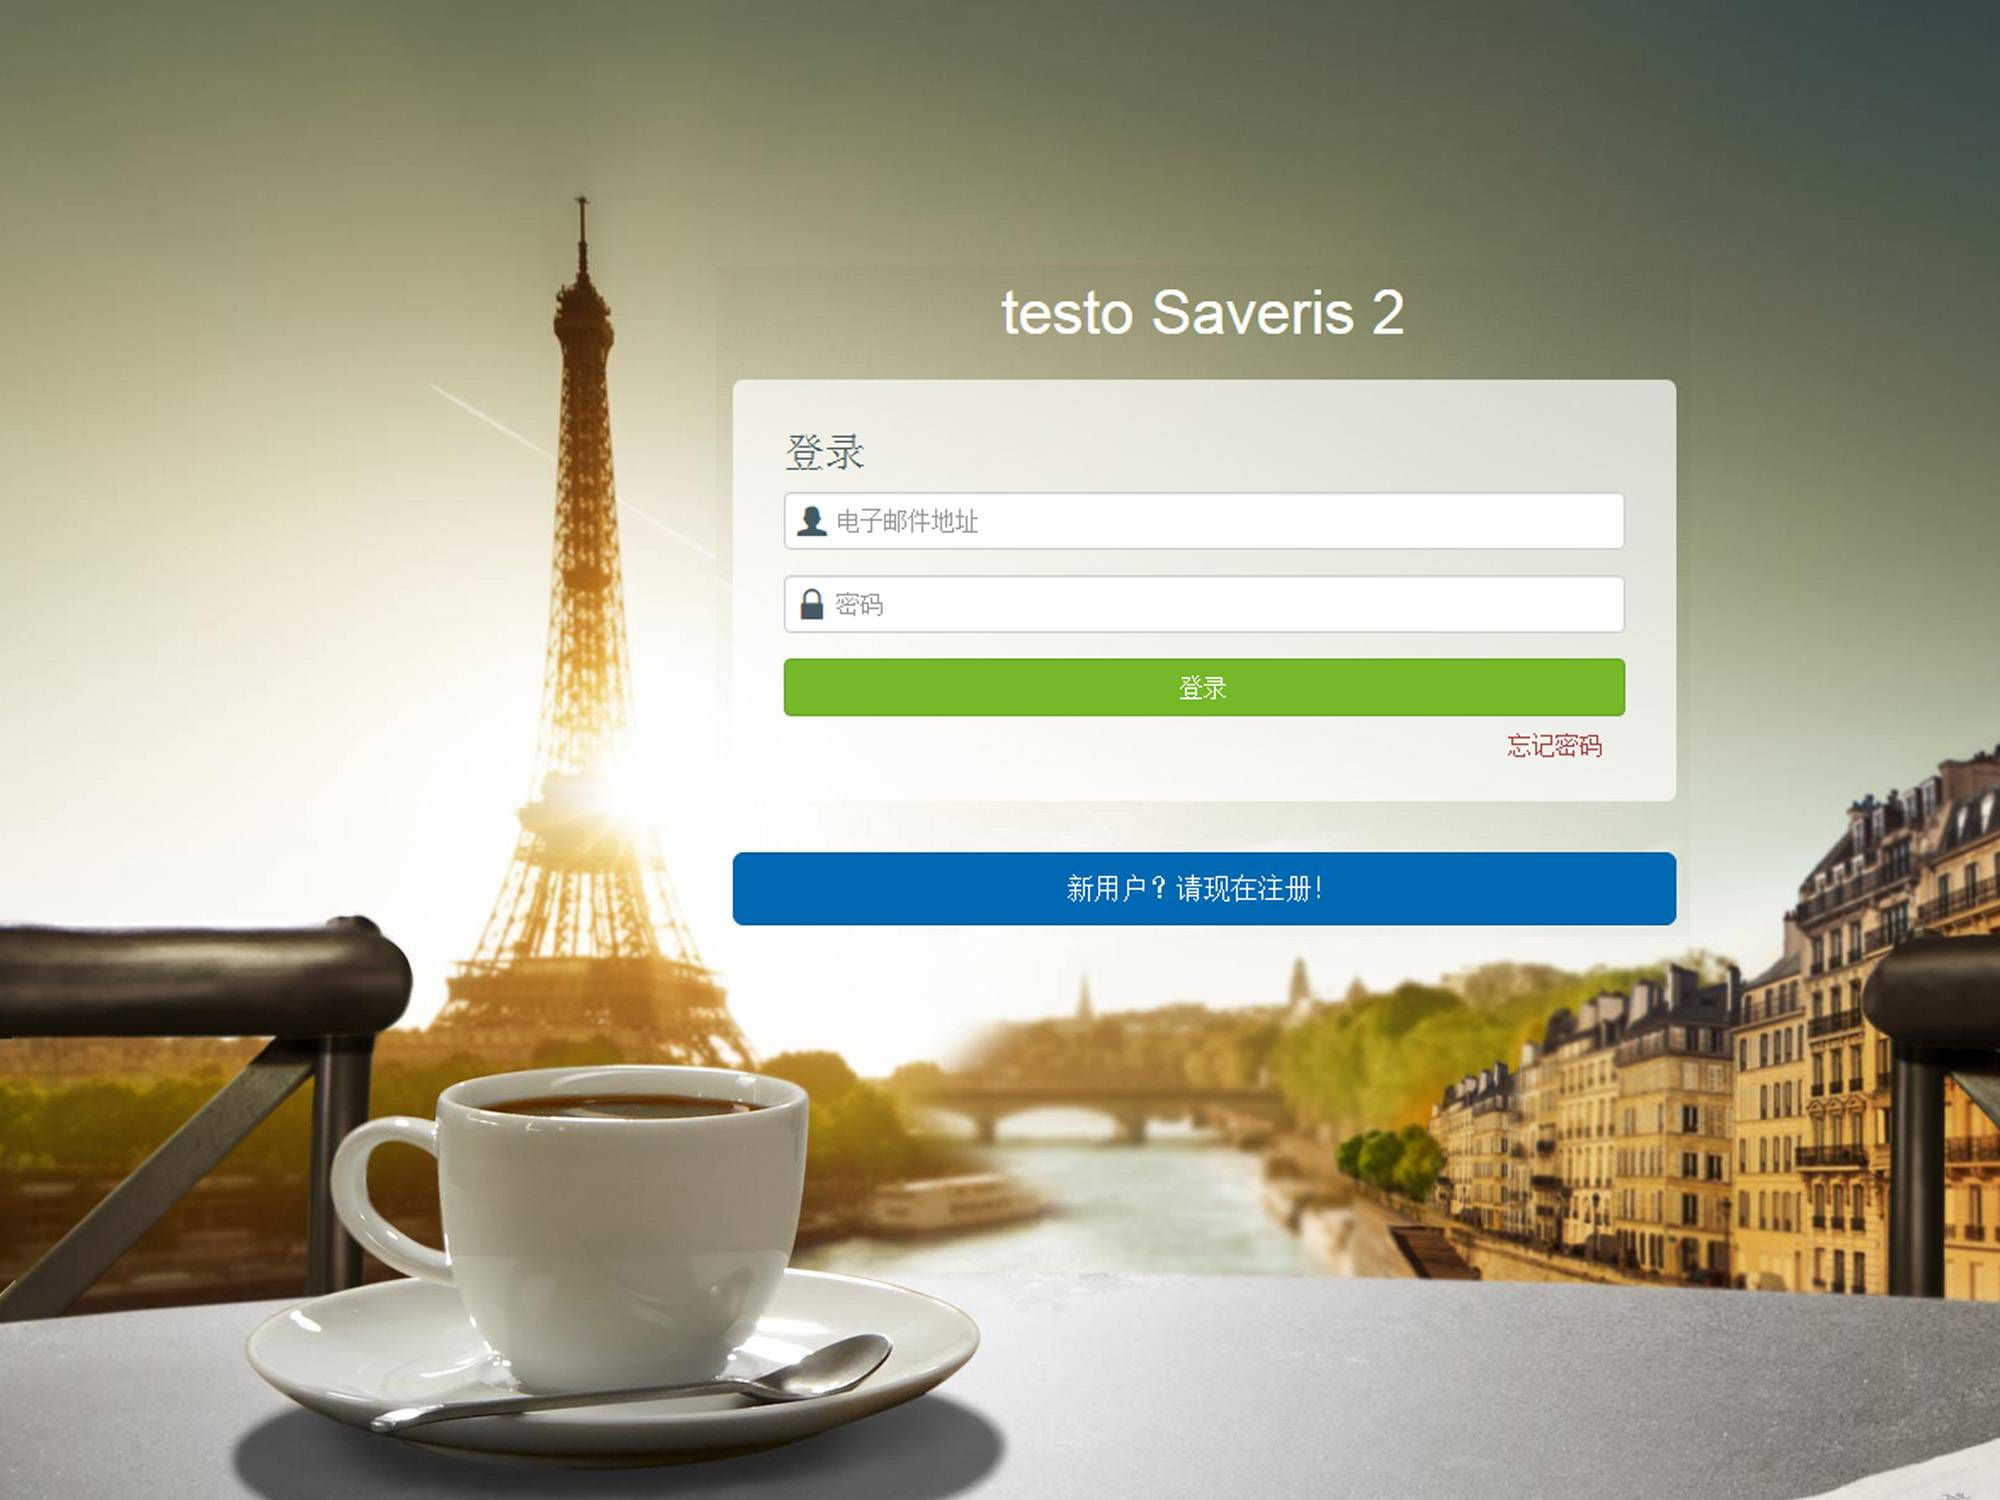 Saveris 2 trial access for the Testo Cloud